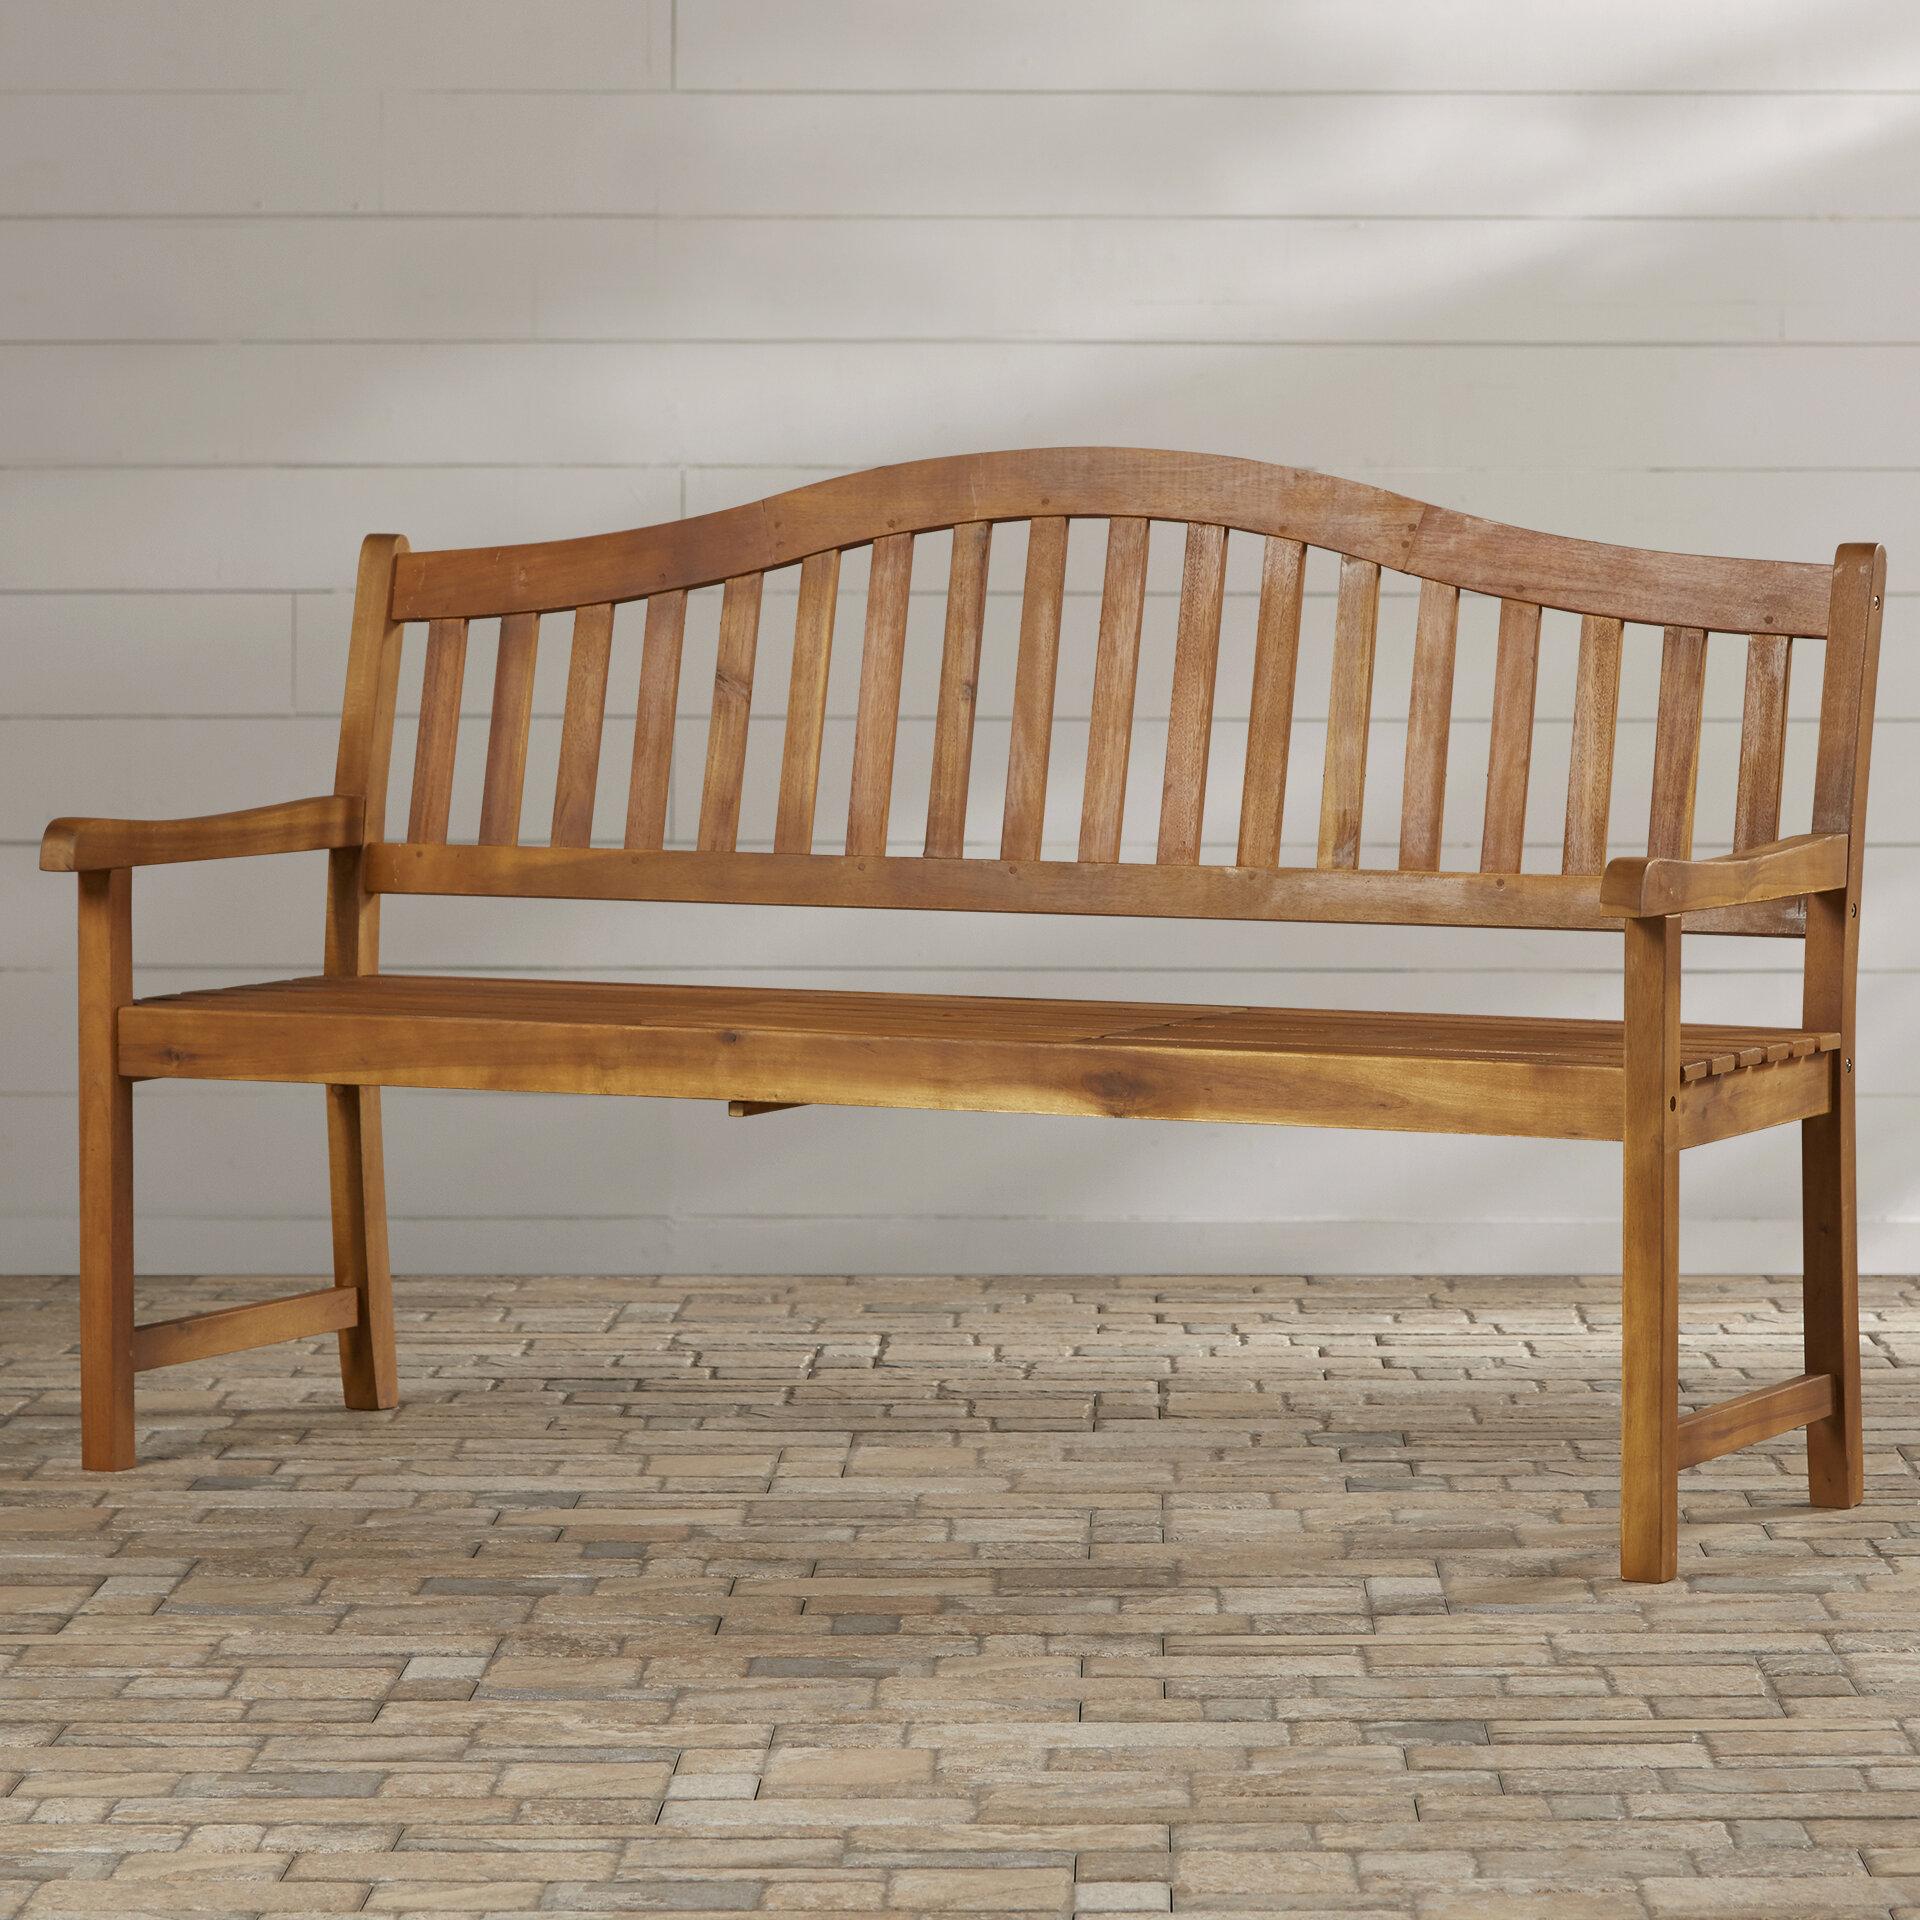 Volusia Wooden Garden Bench & Reviews | Birch Lane